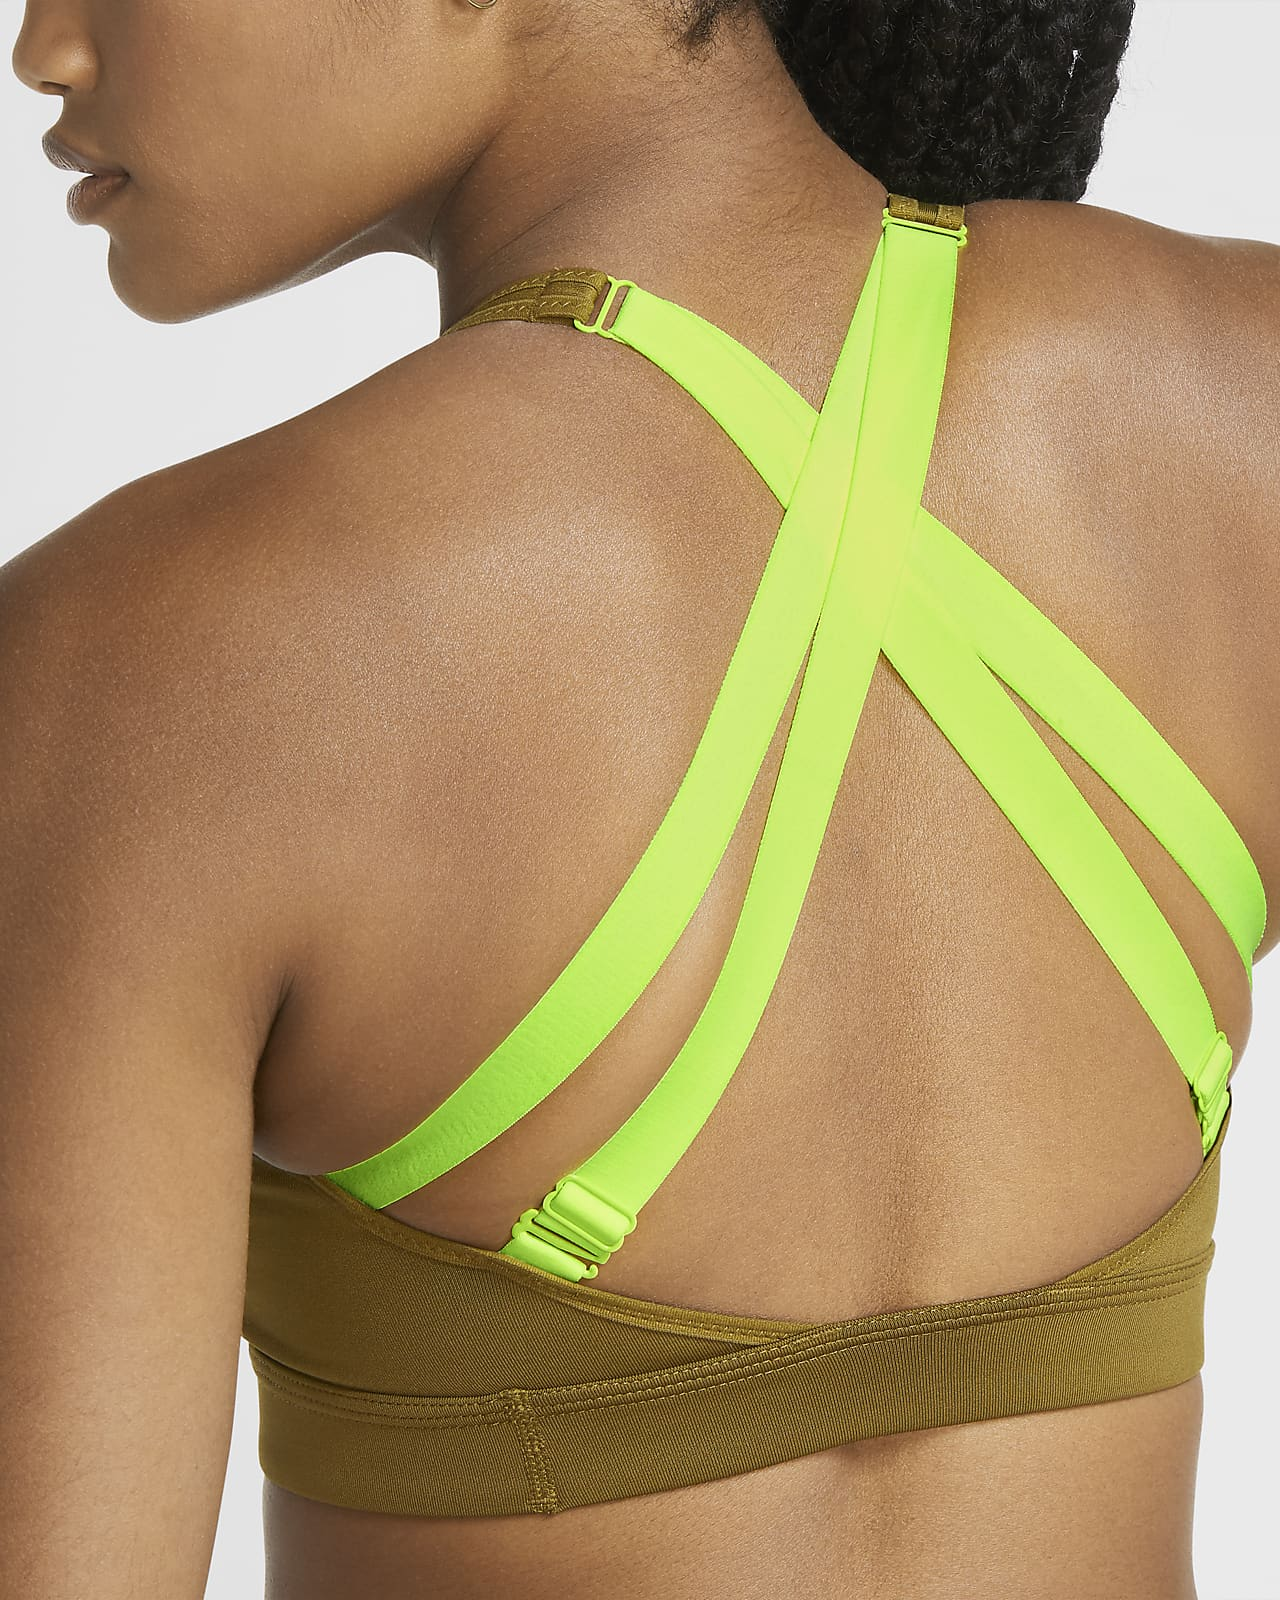 Nike Impact Strappy Women's High